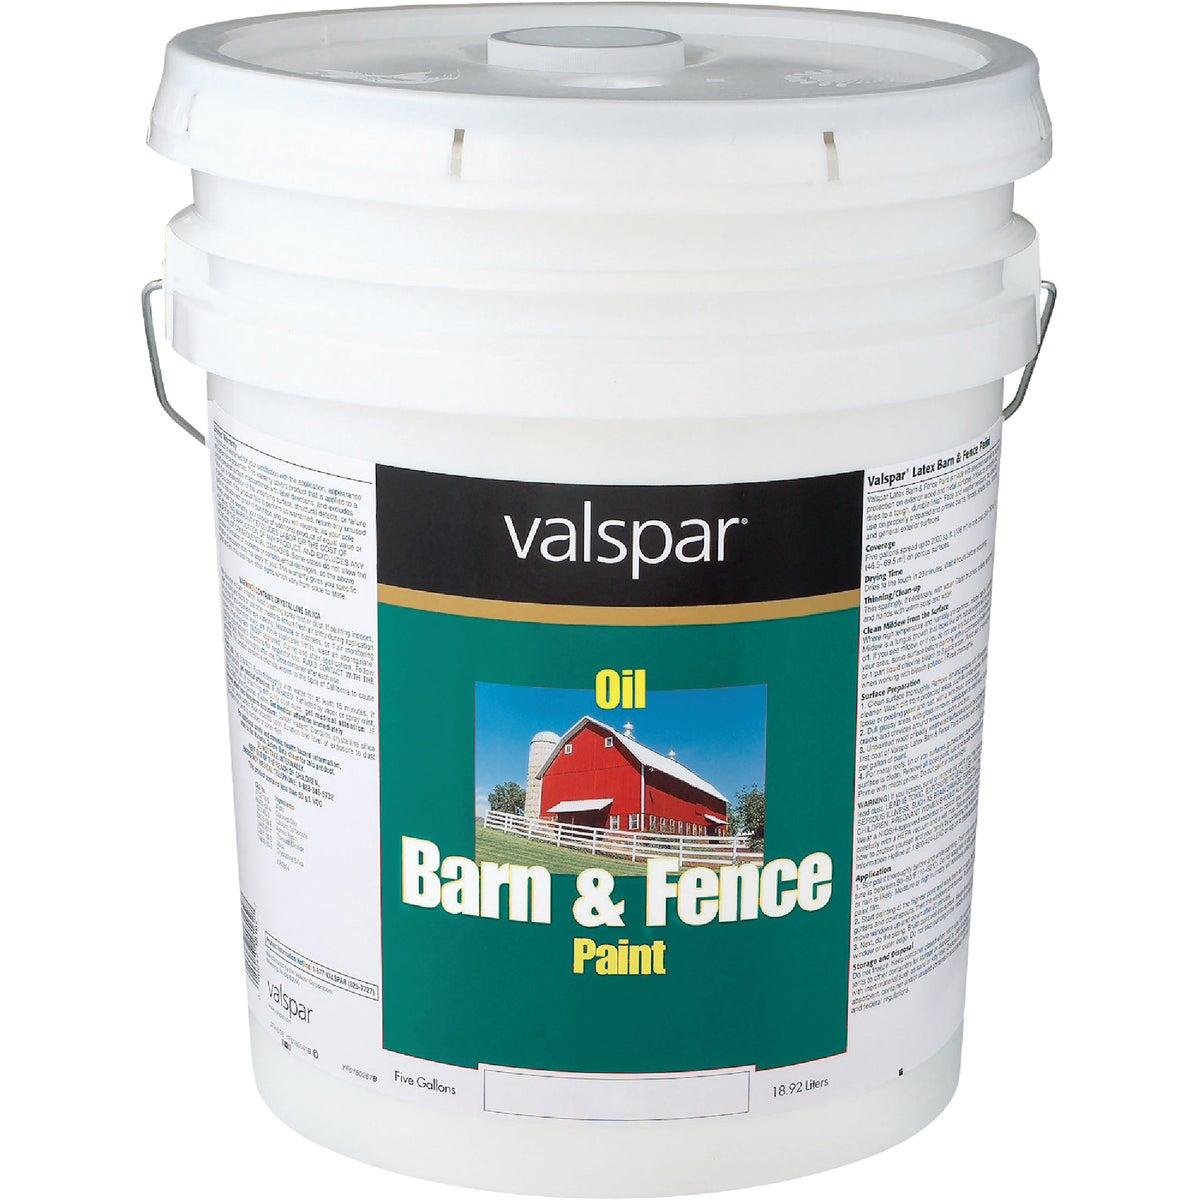 5GAL ALK WHT BARN PAINT - 018.3145-75.008 by Valspar Corp